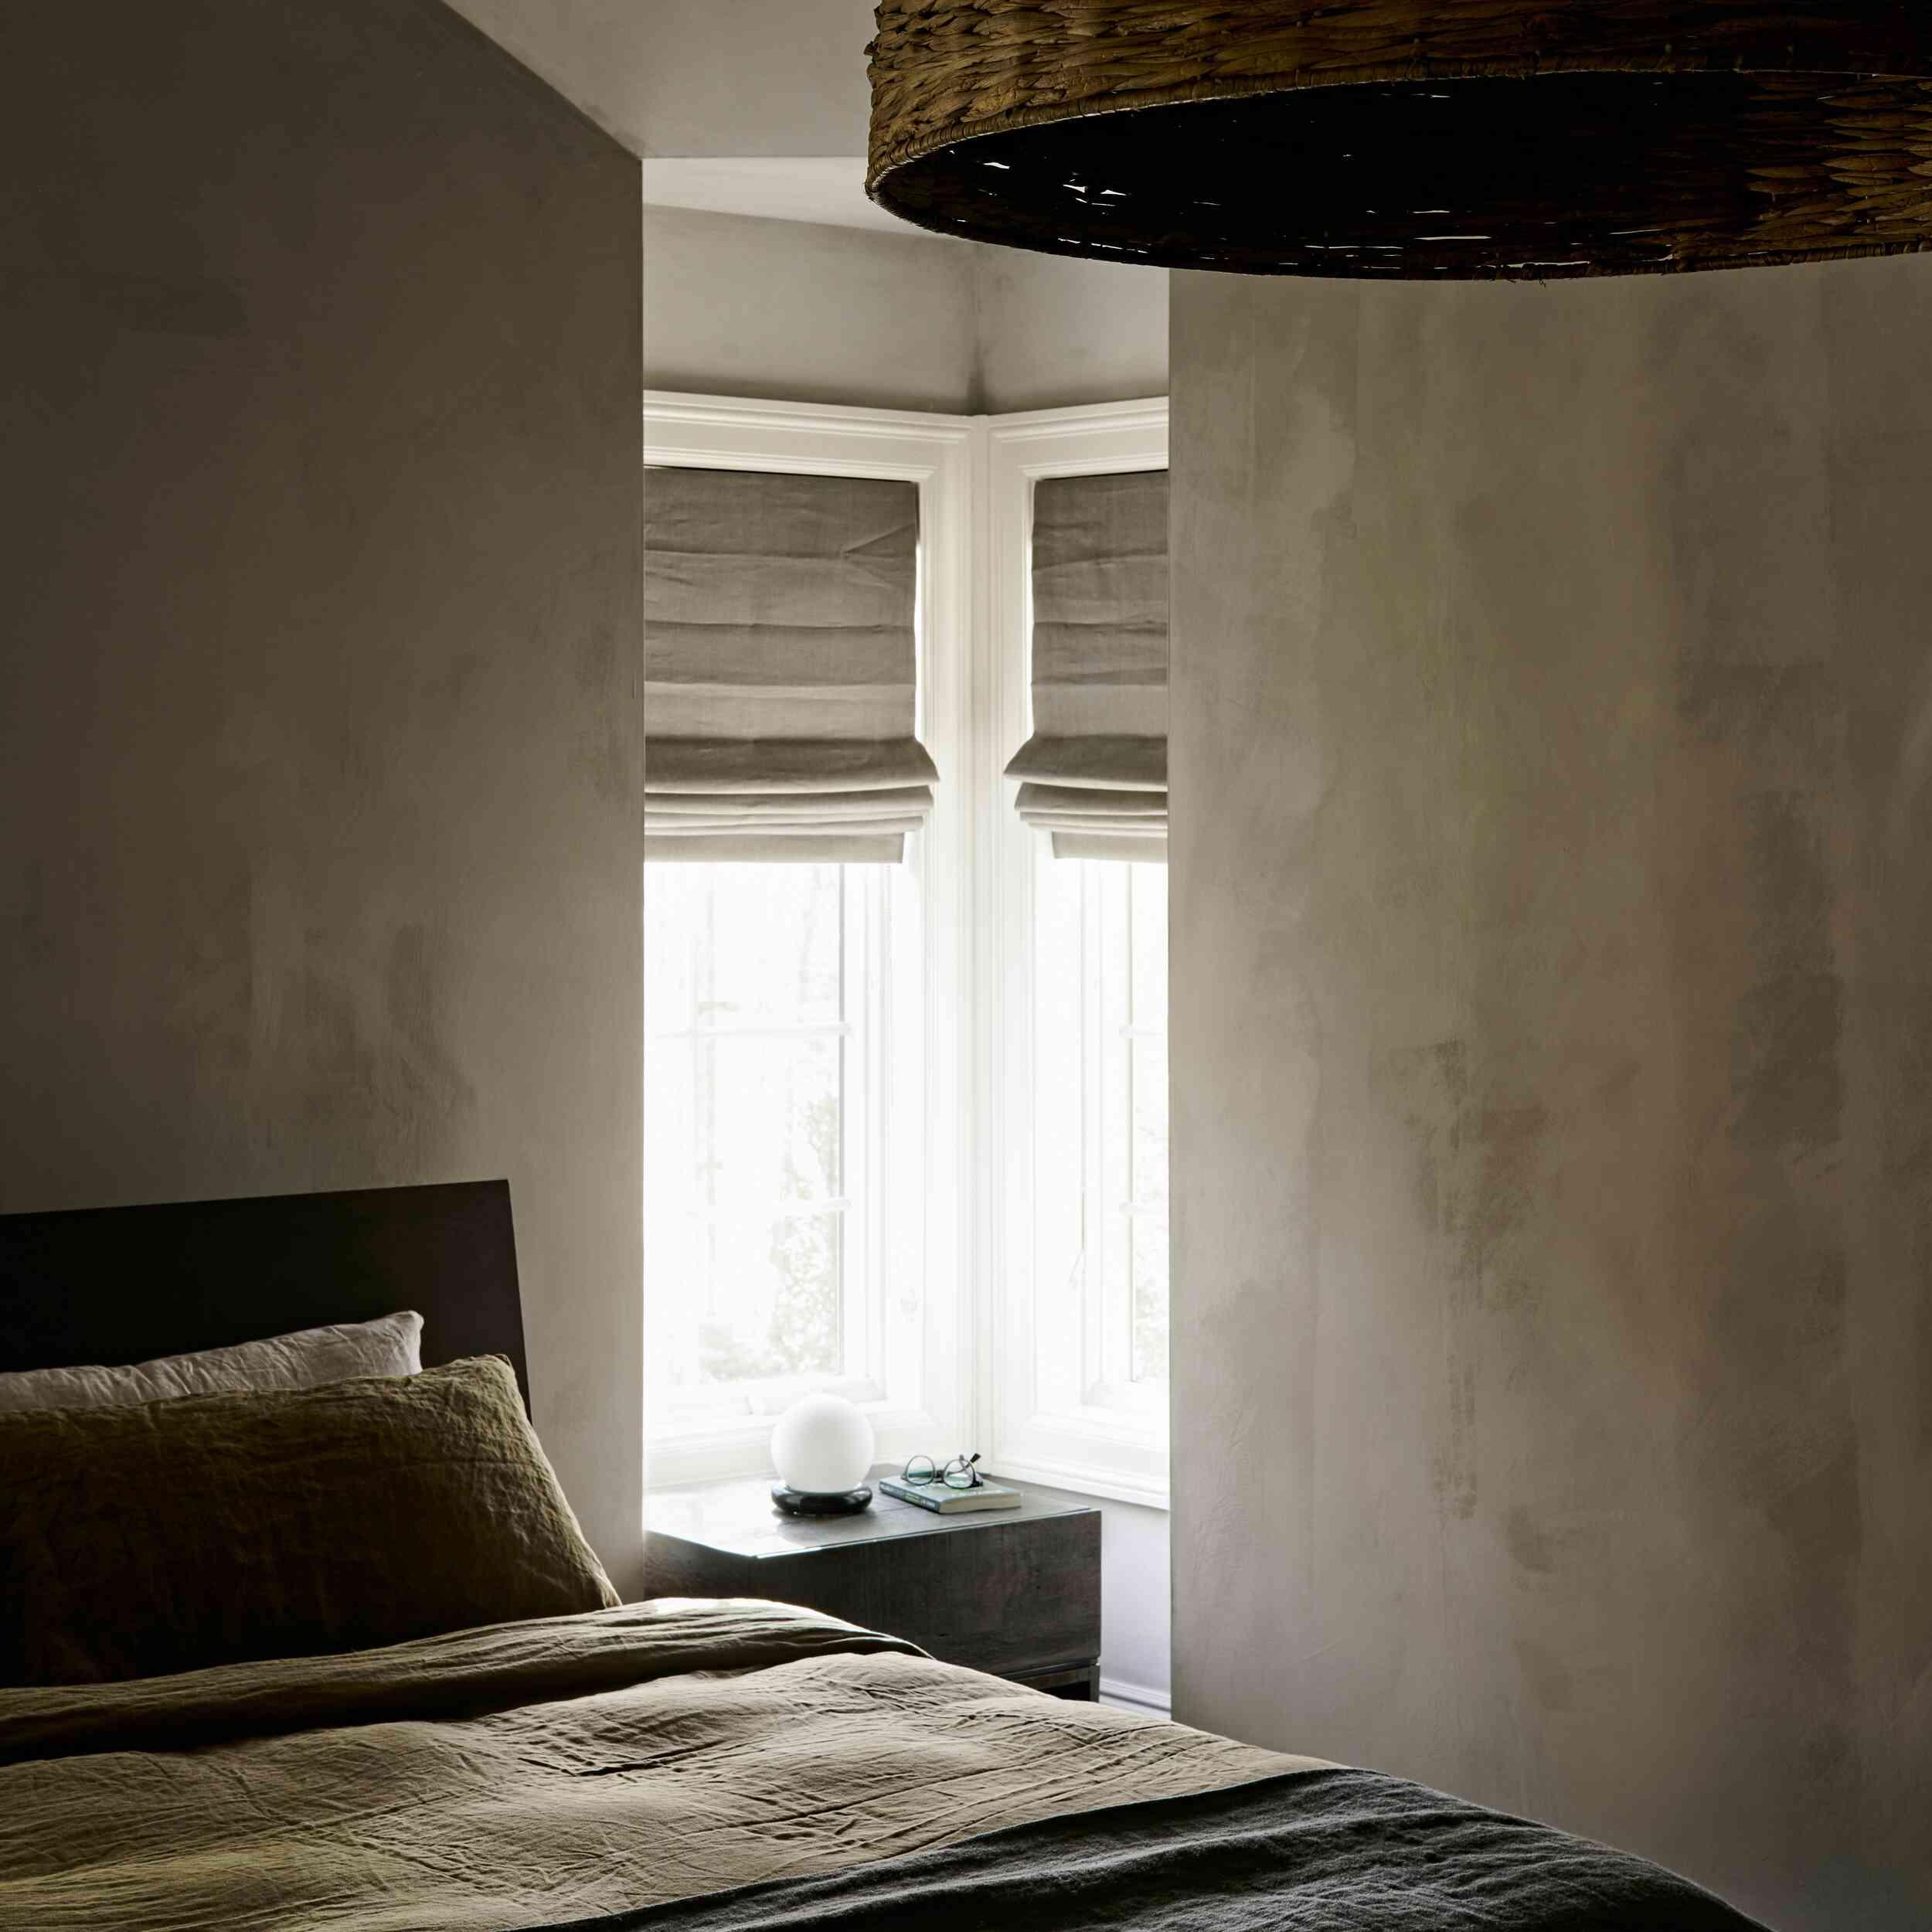 Moody bedroom with matte gray textured walls